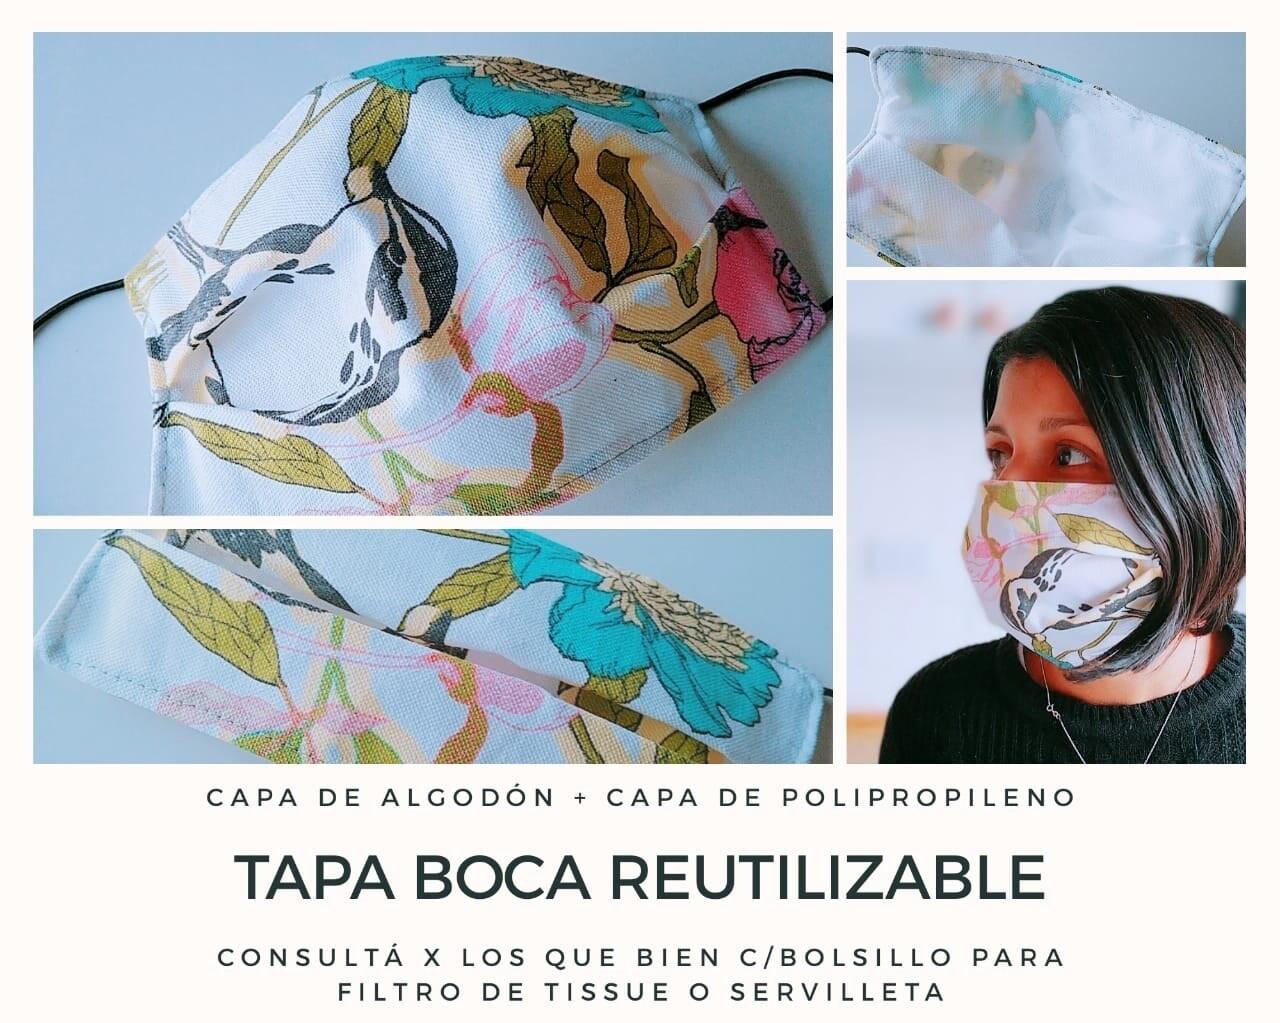 Tapa Boca Reutilizable